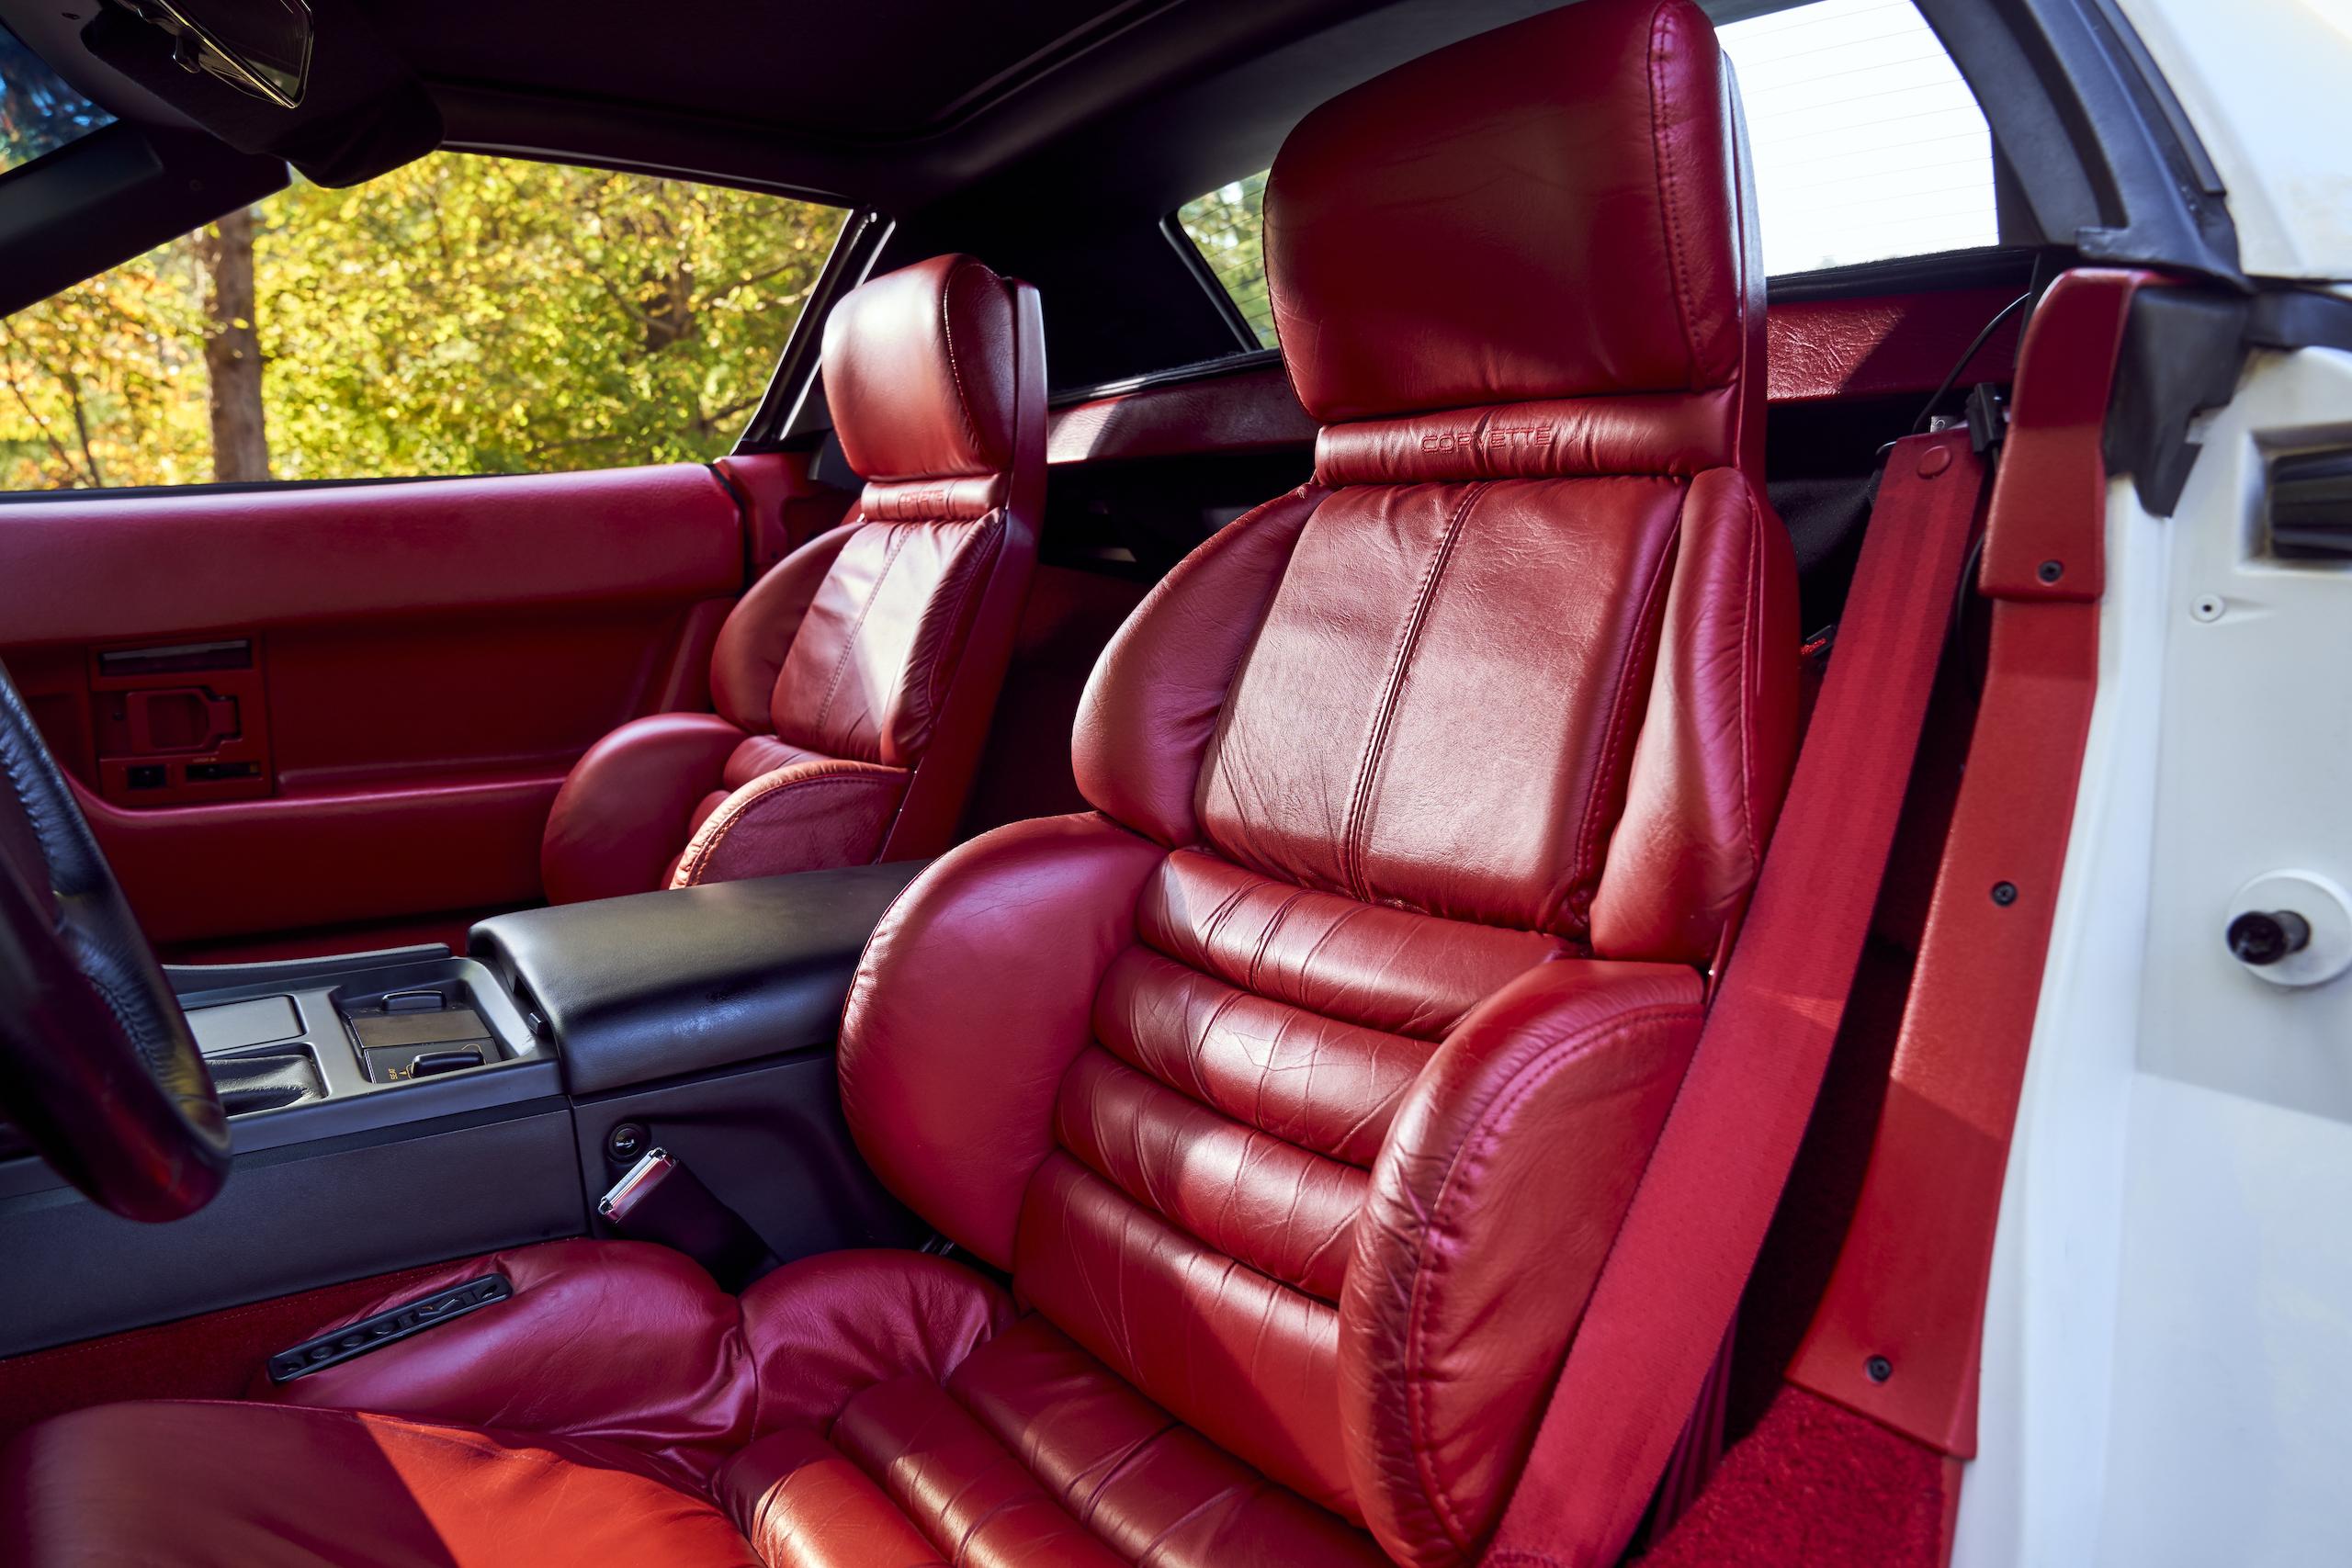 C4 Chevrolet Corvette red leather seats